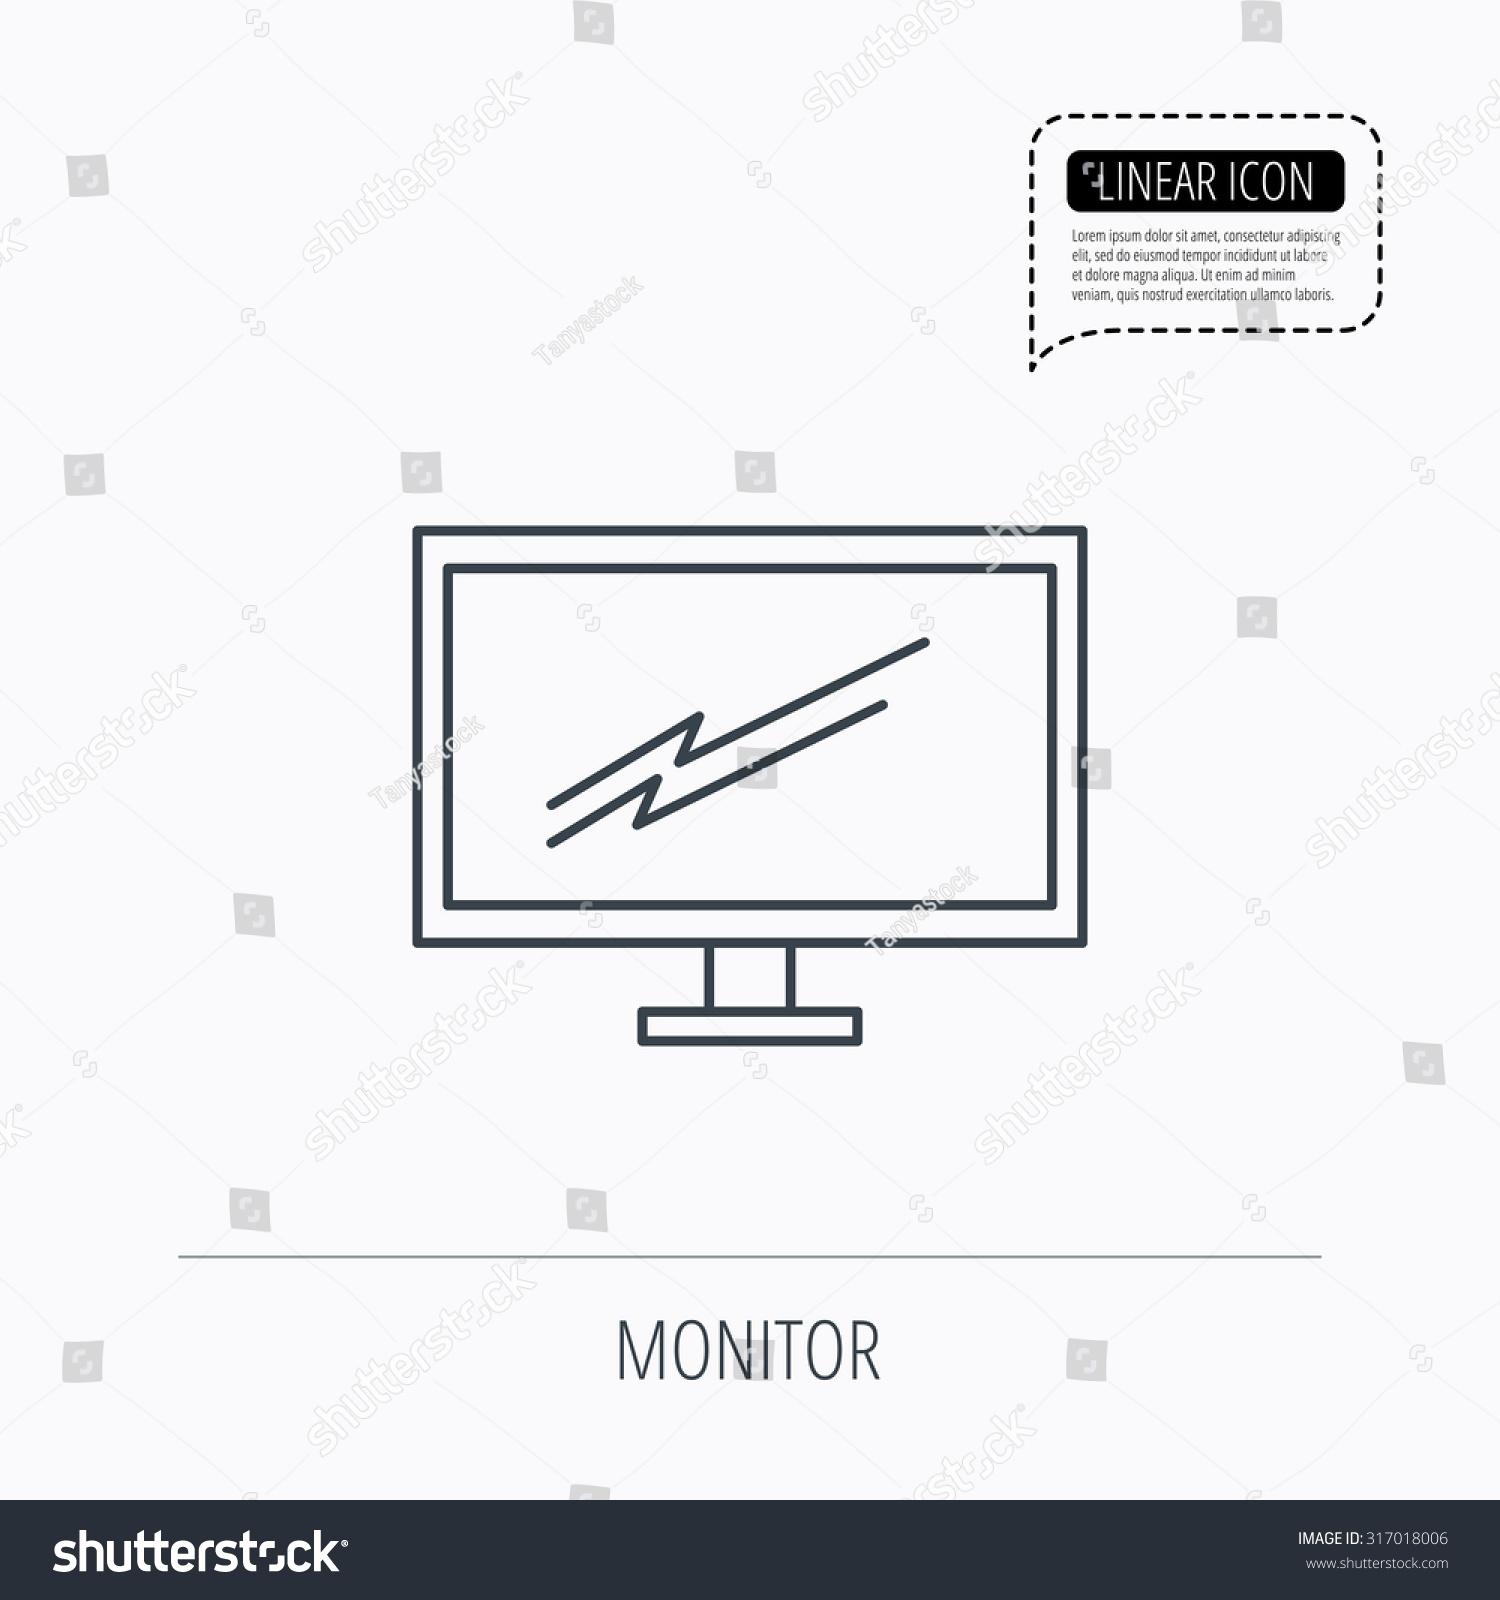 Fantastisch Led Symbole Fotos - Schaltplan-Ideen - mesoul.info